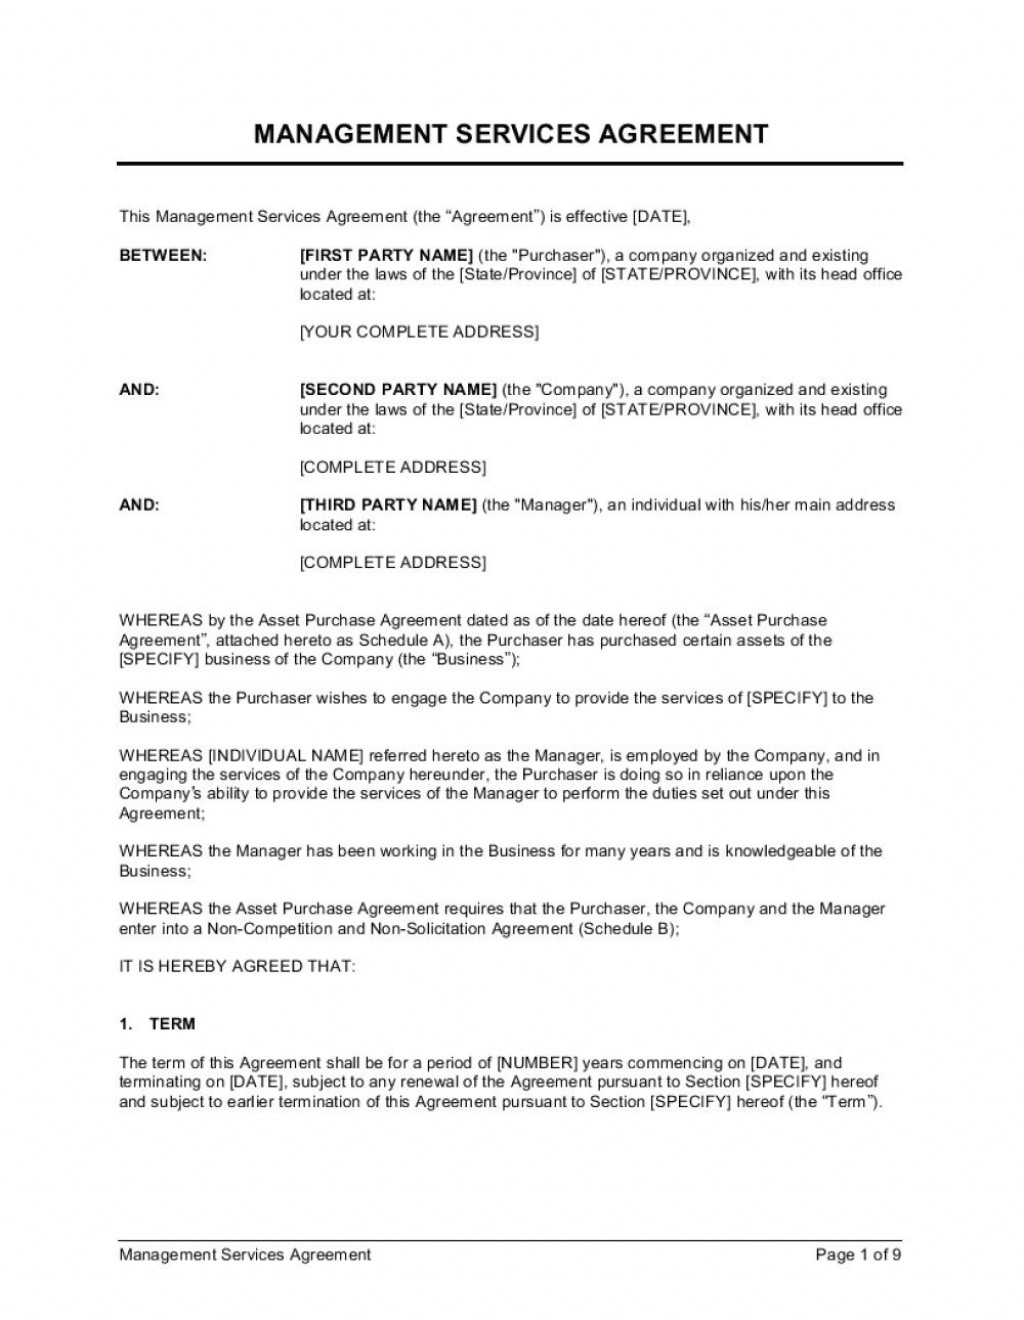 004 Breathtaking Master Service Agreement Template Design  Free AustraliaLarge